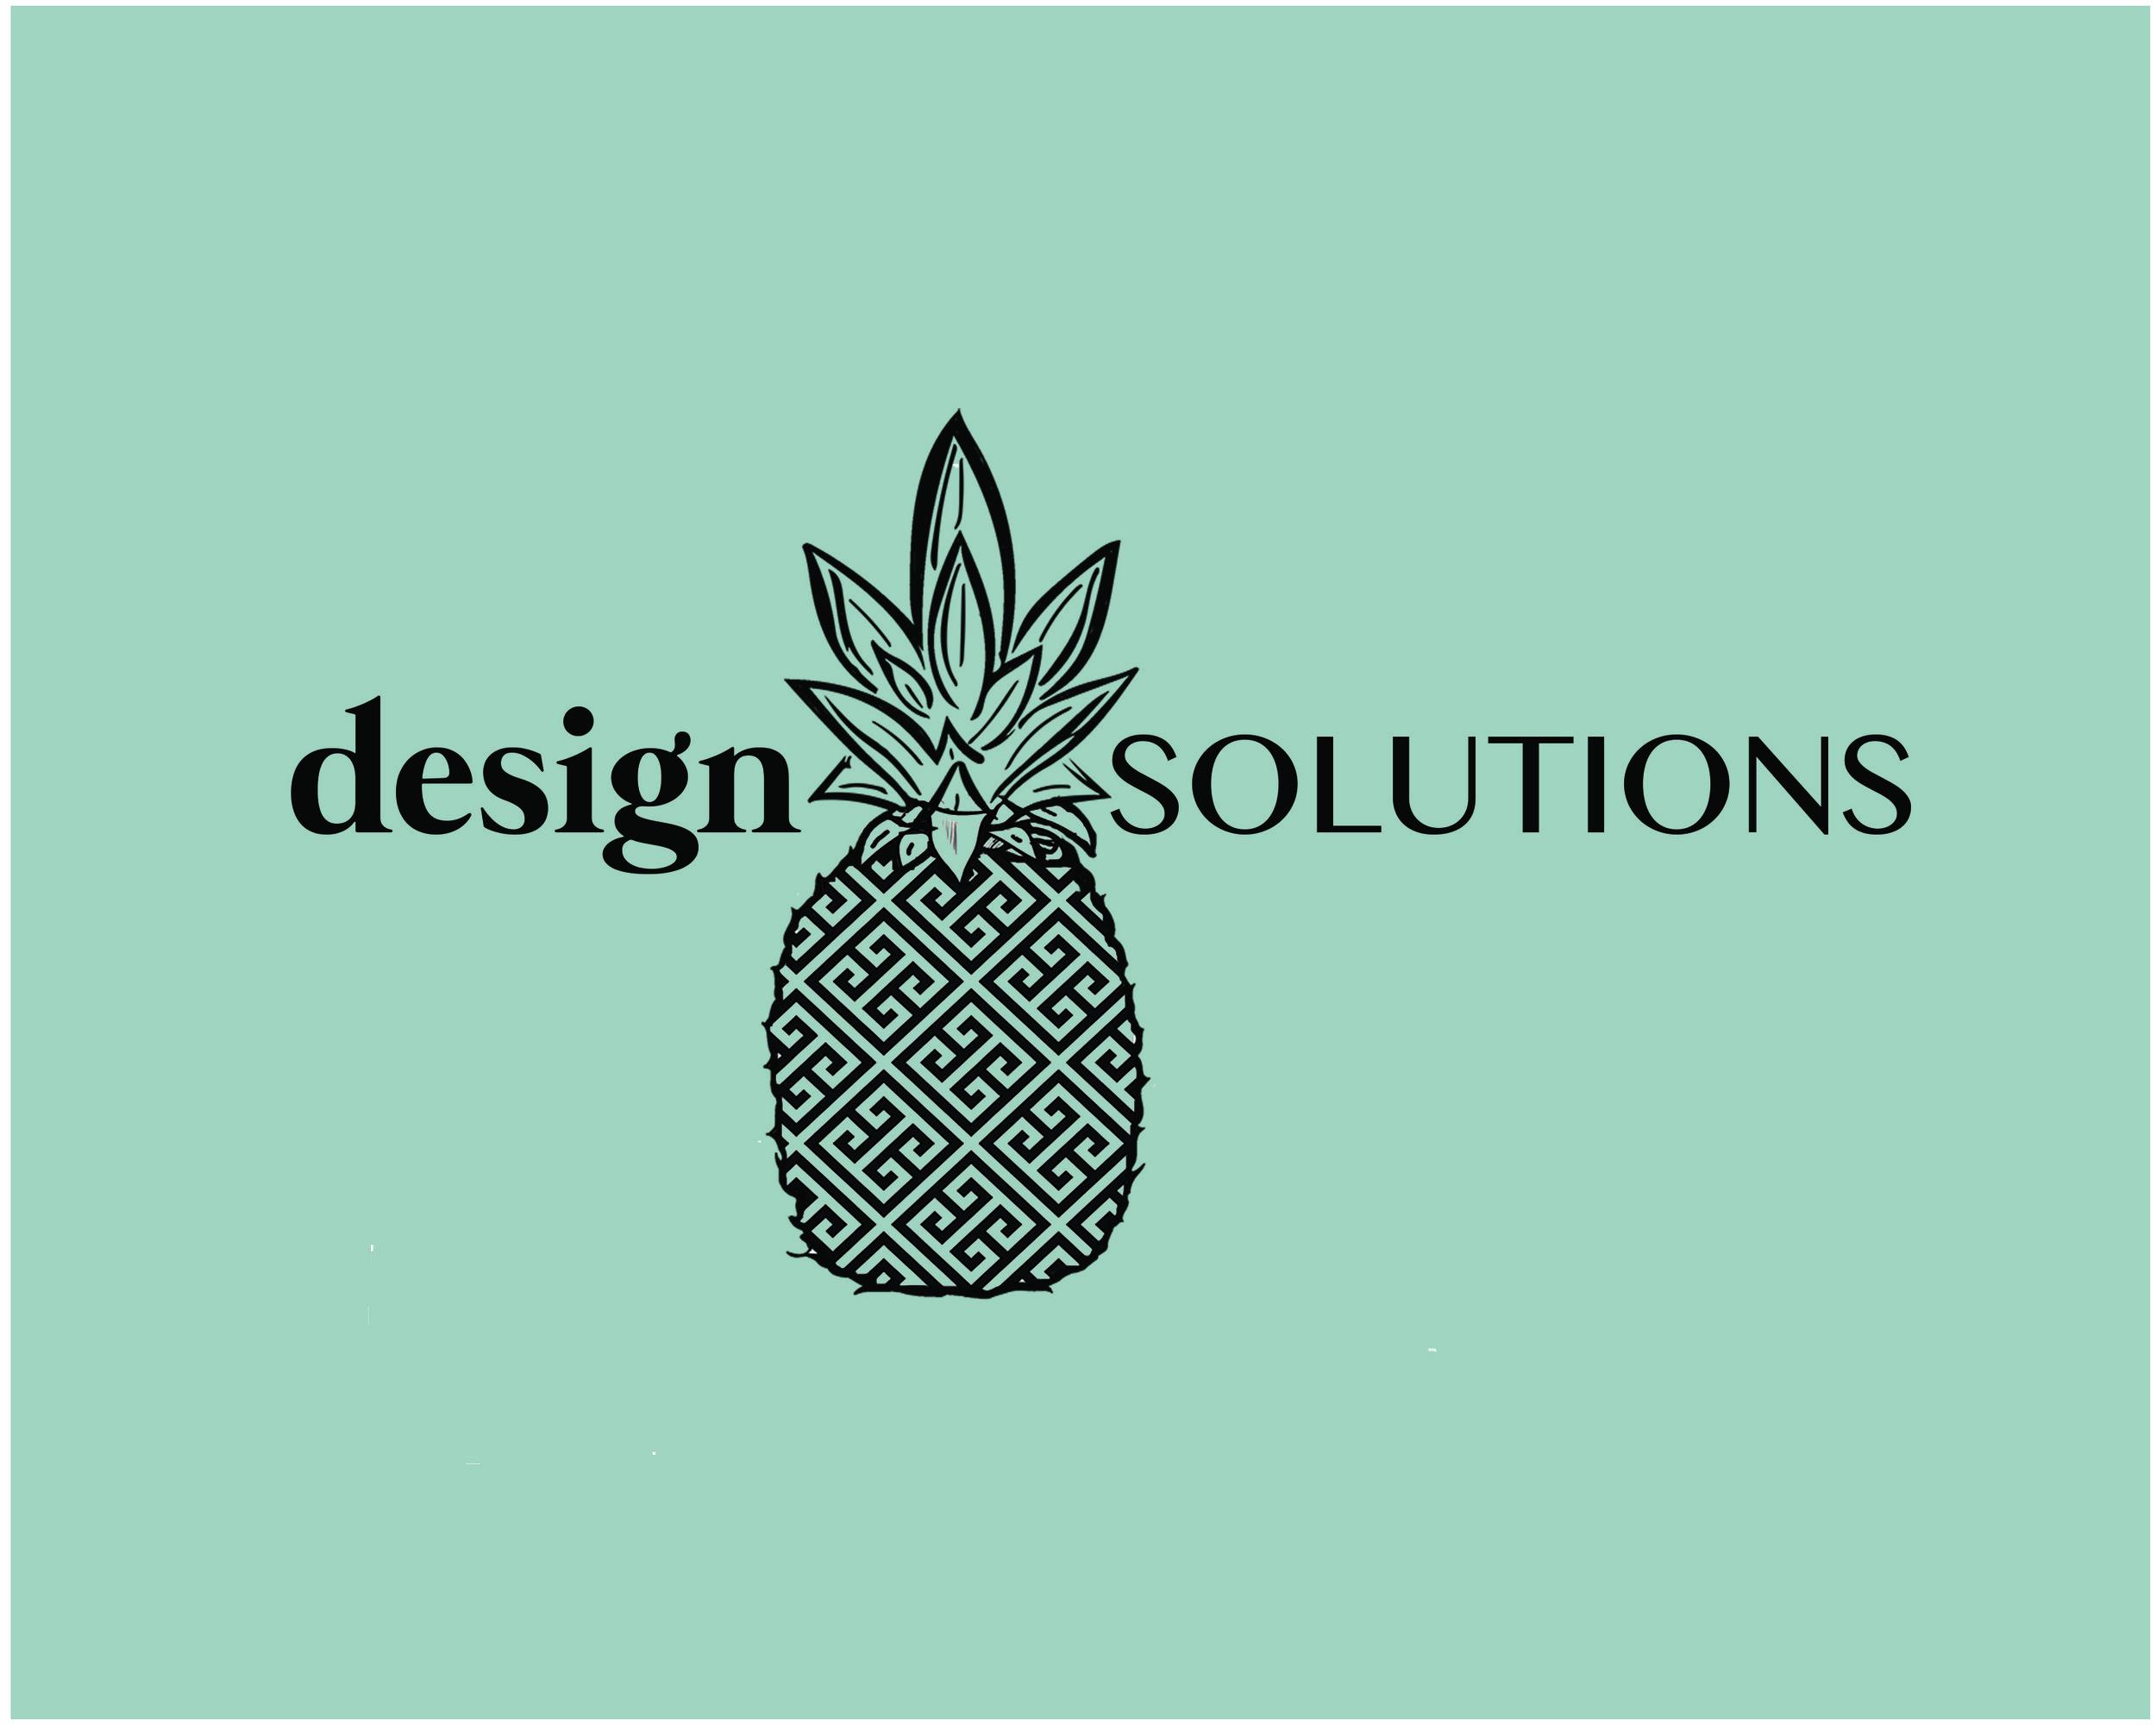 Design Solutions Logo Orlando Branding Agency.jpg